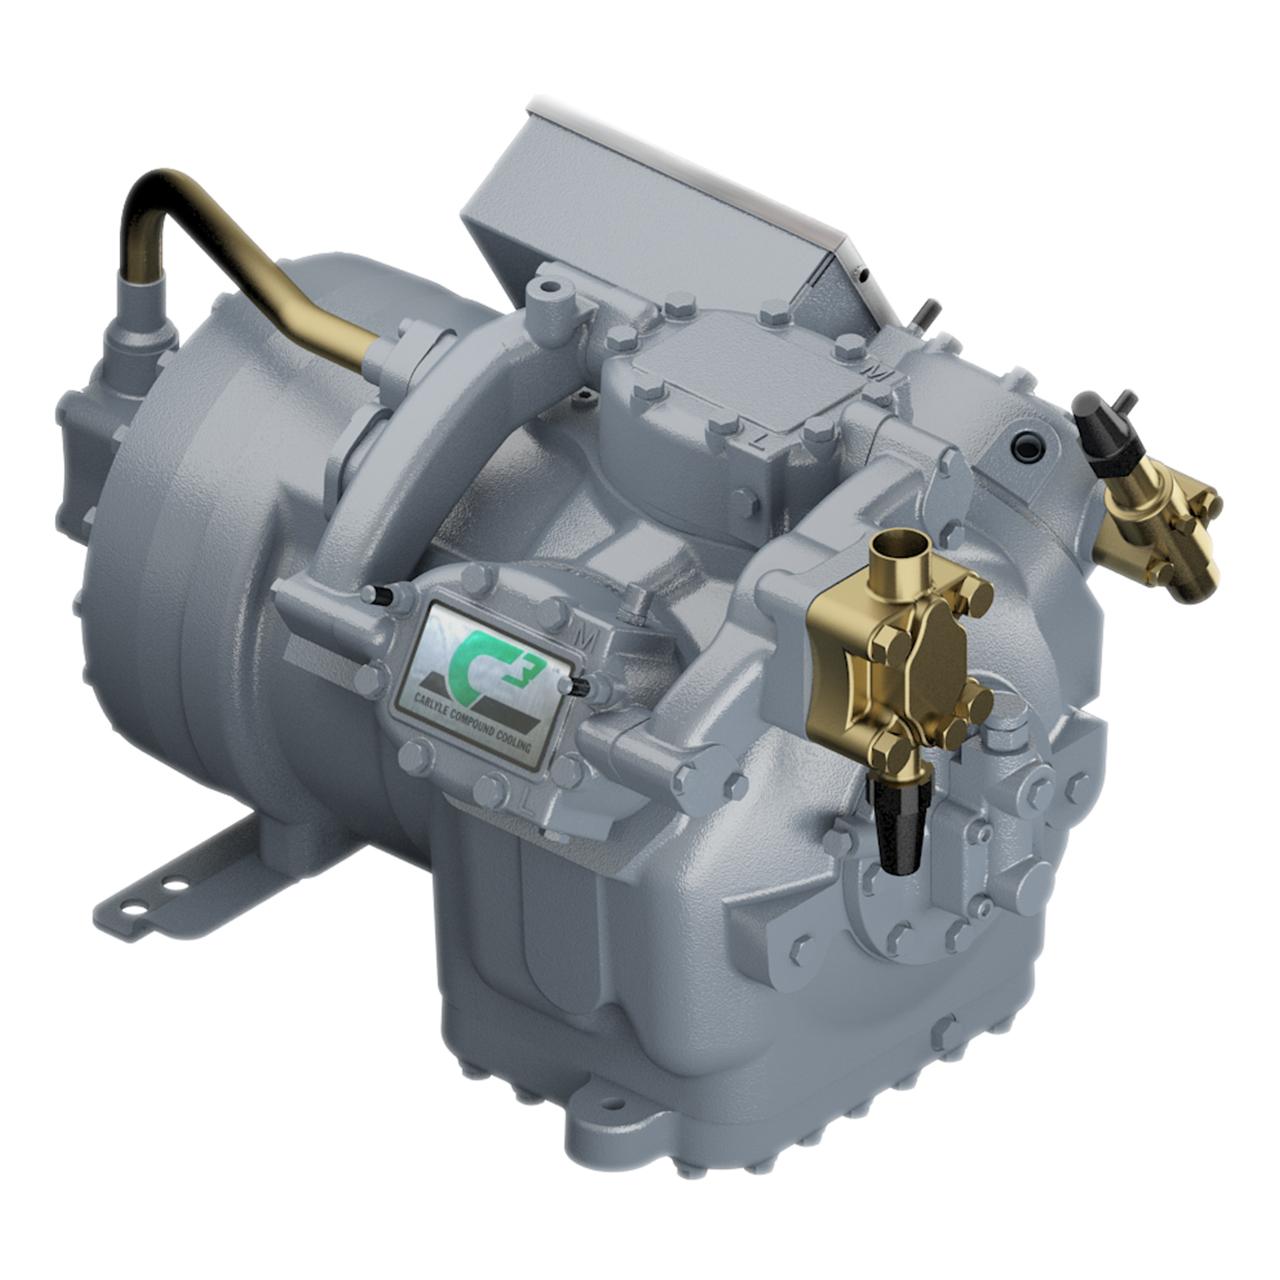 carlyle-compressor-06cc